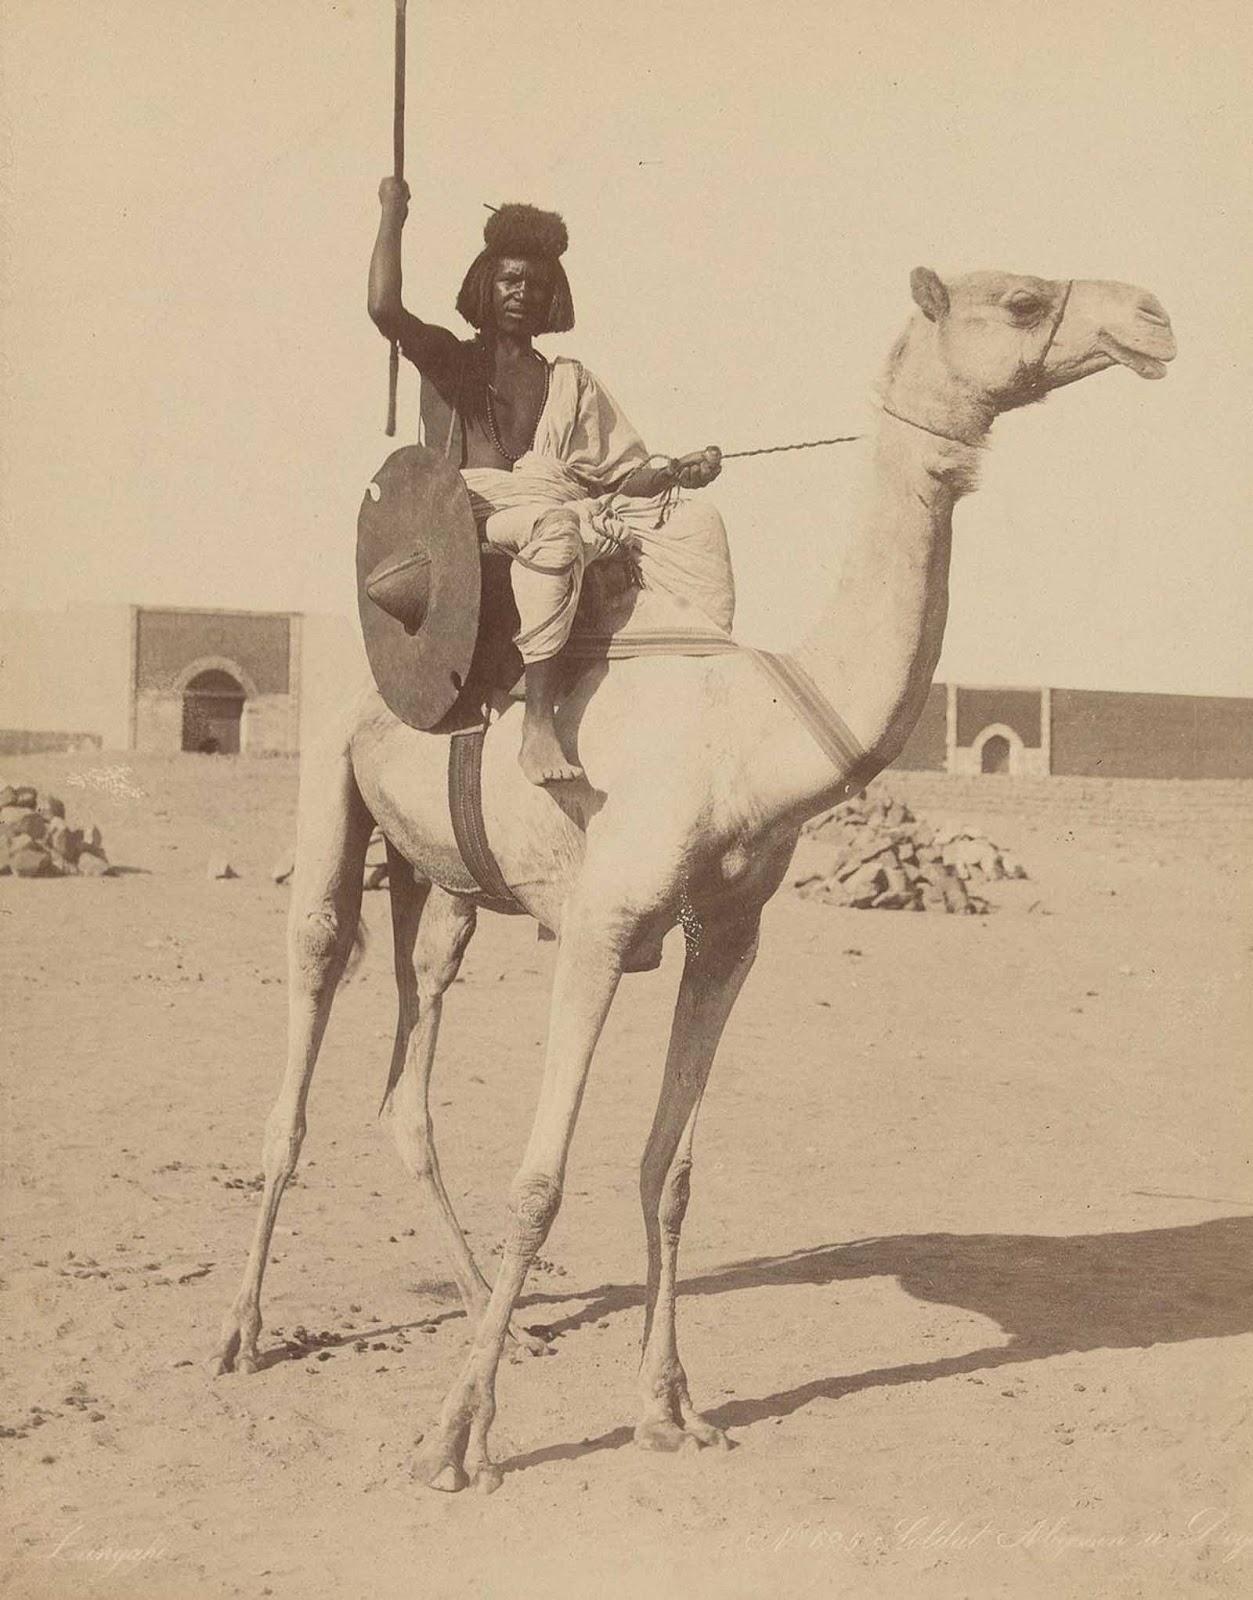 Soldado da tribo Bisharin